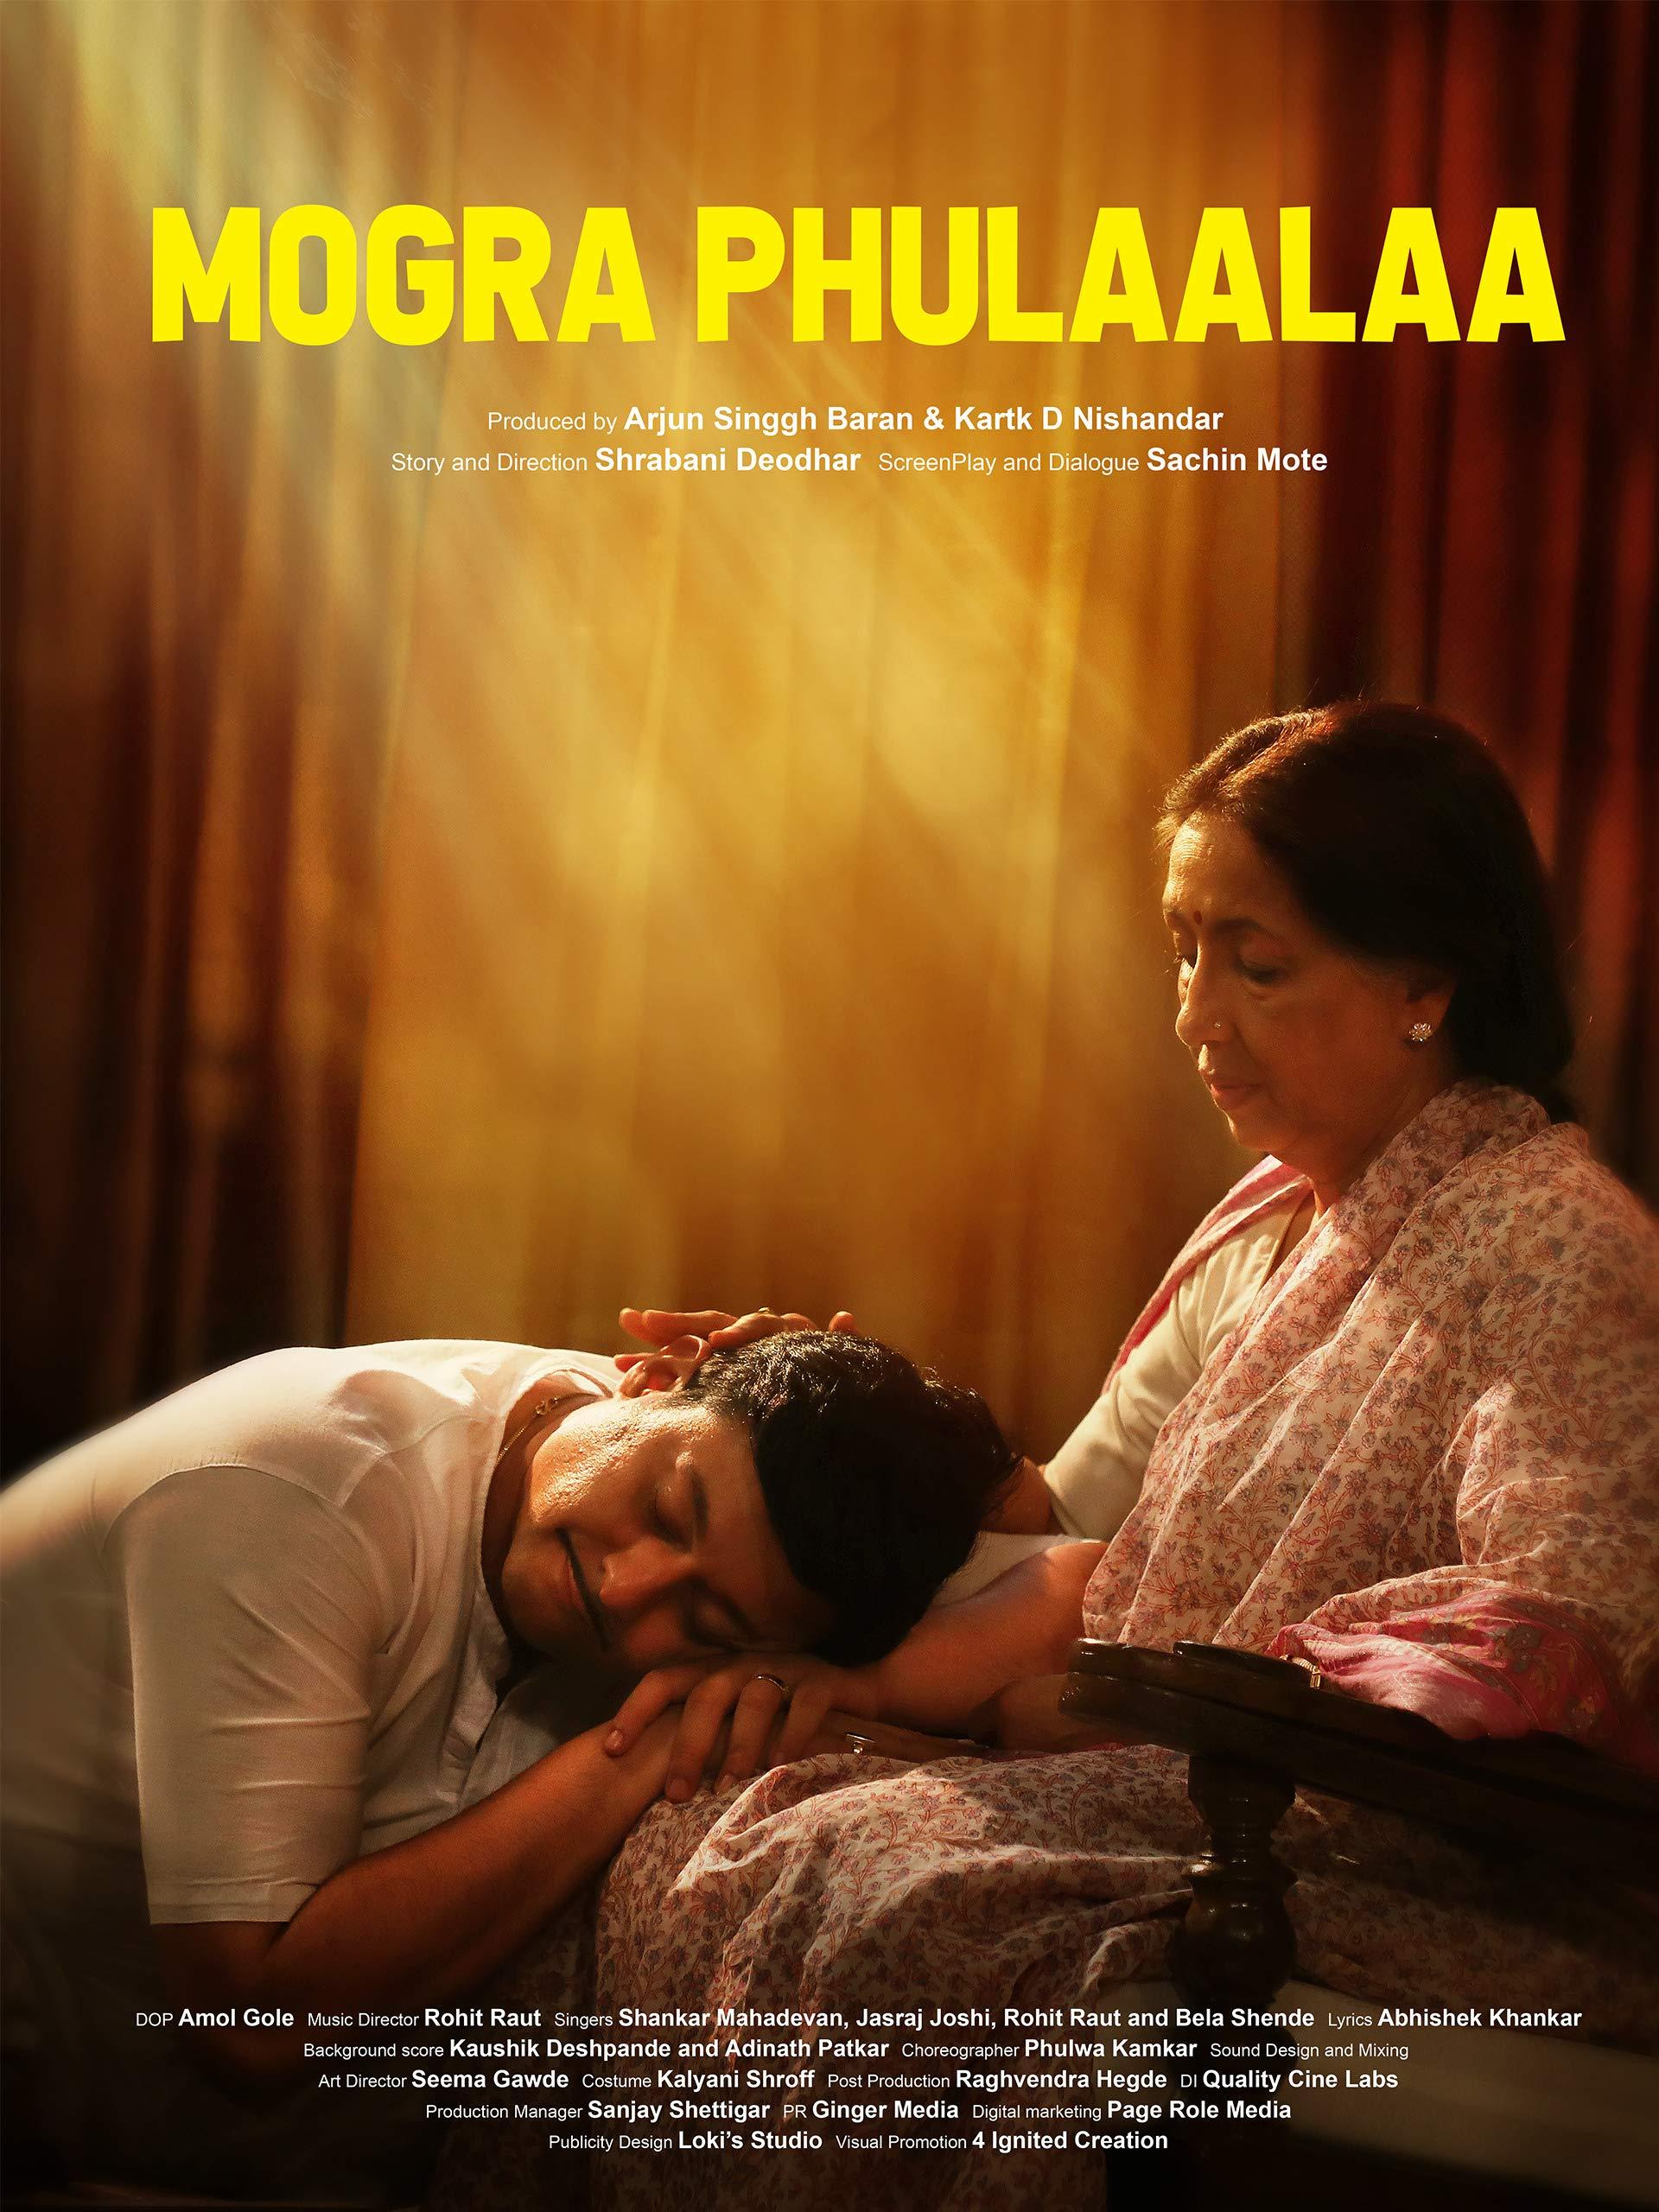 Mogra Phulaalaa